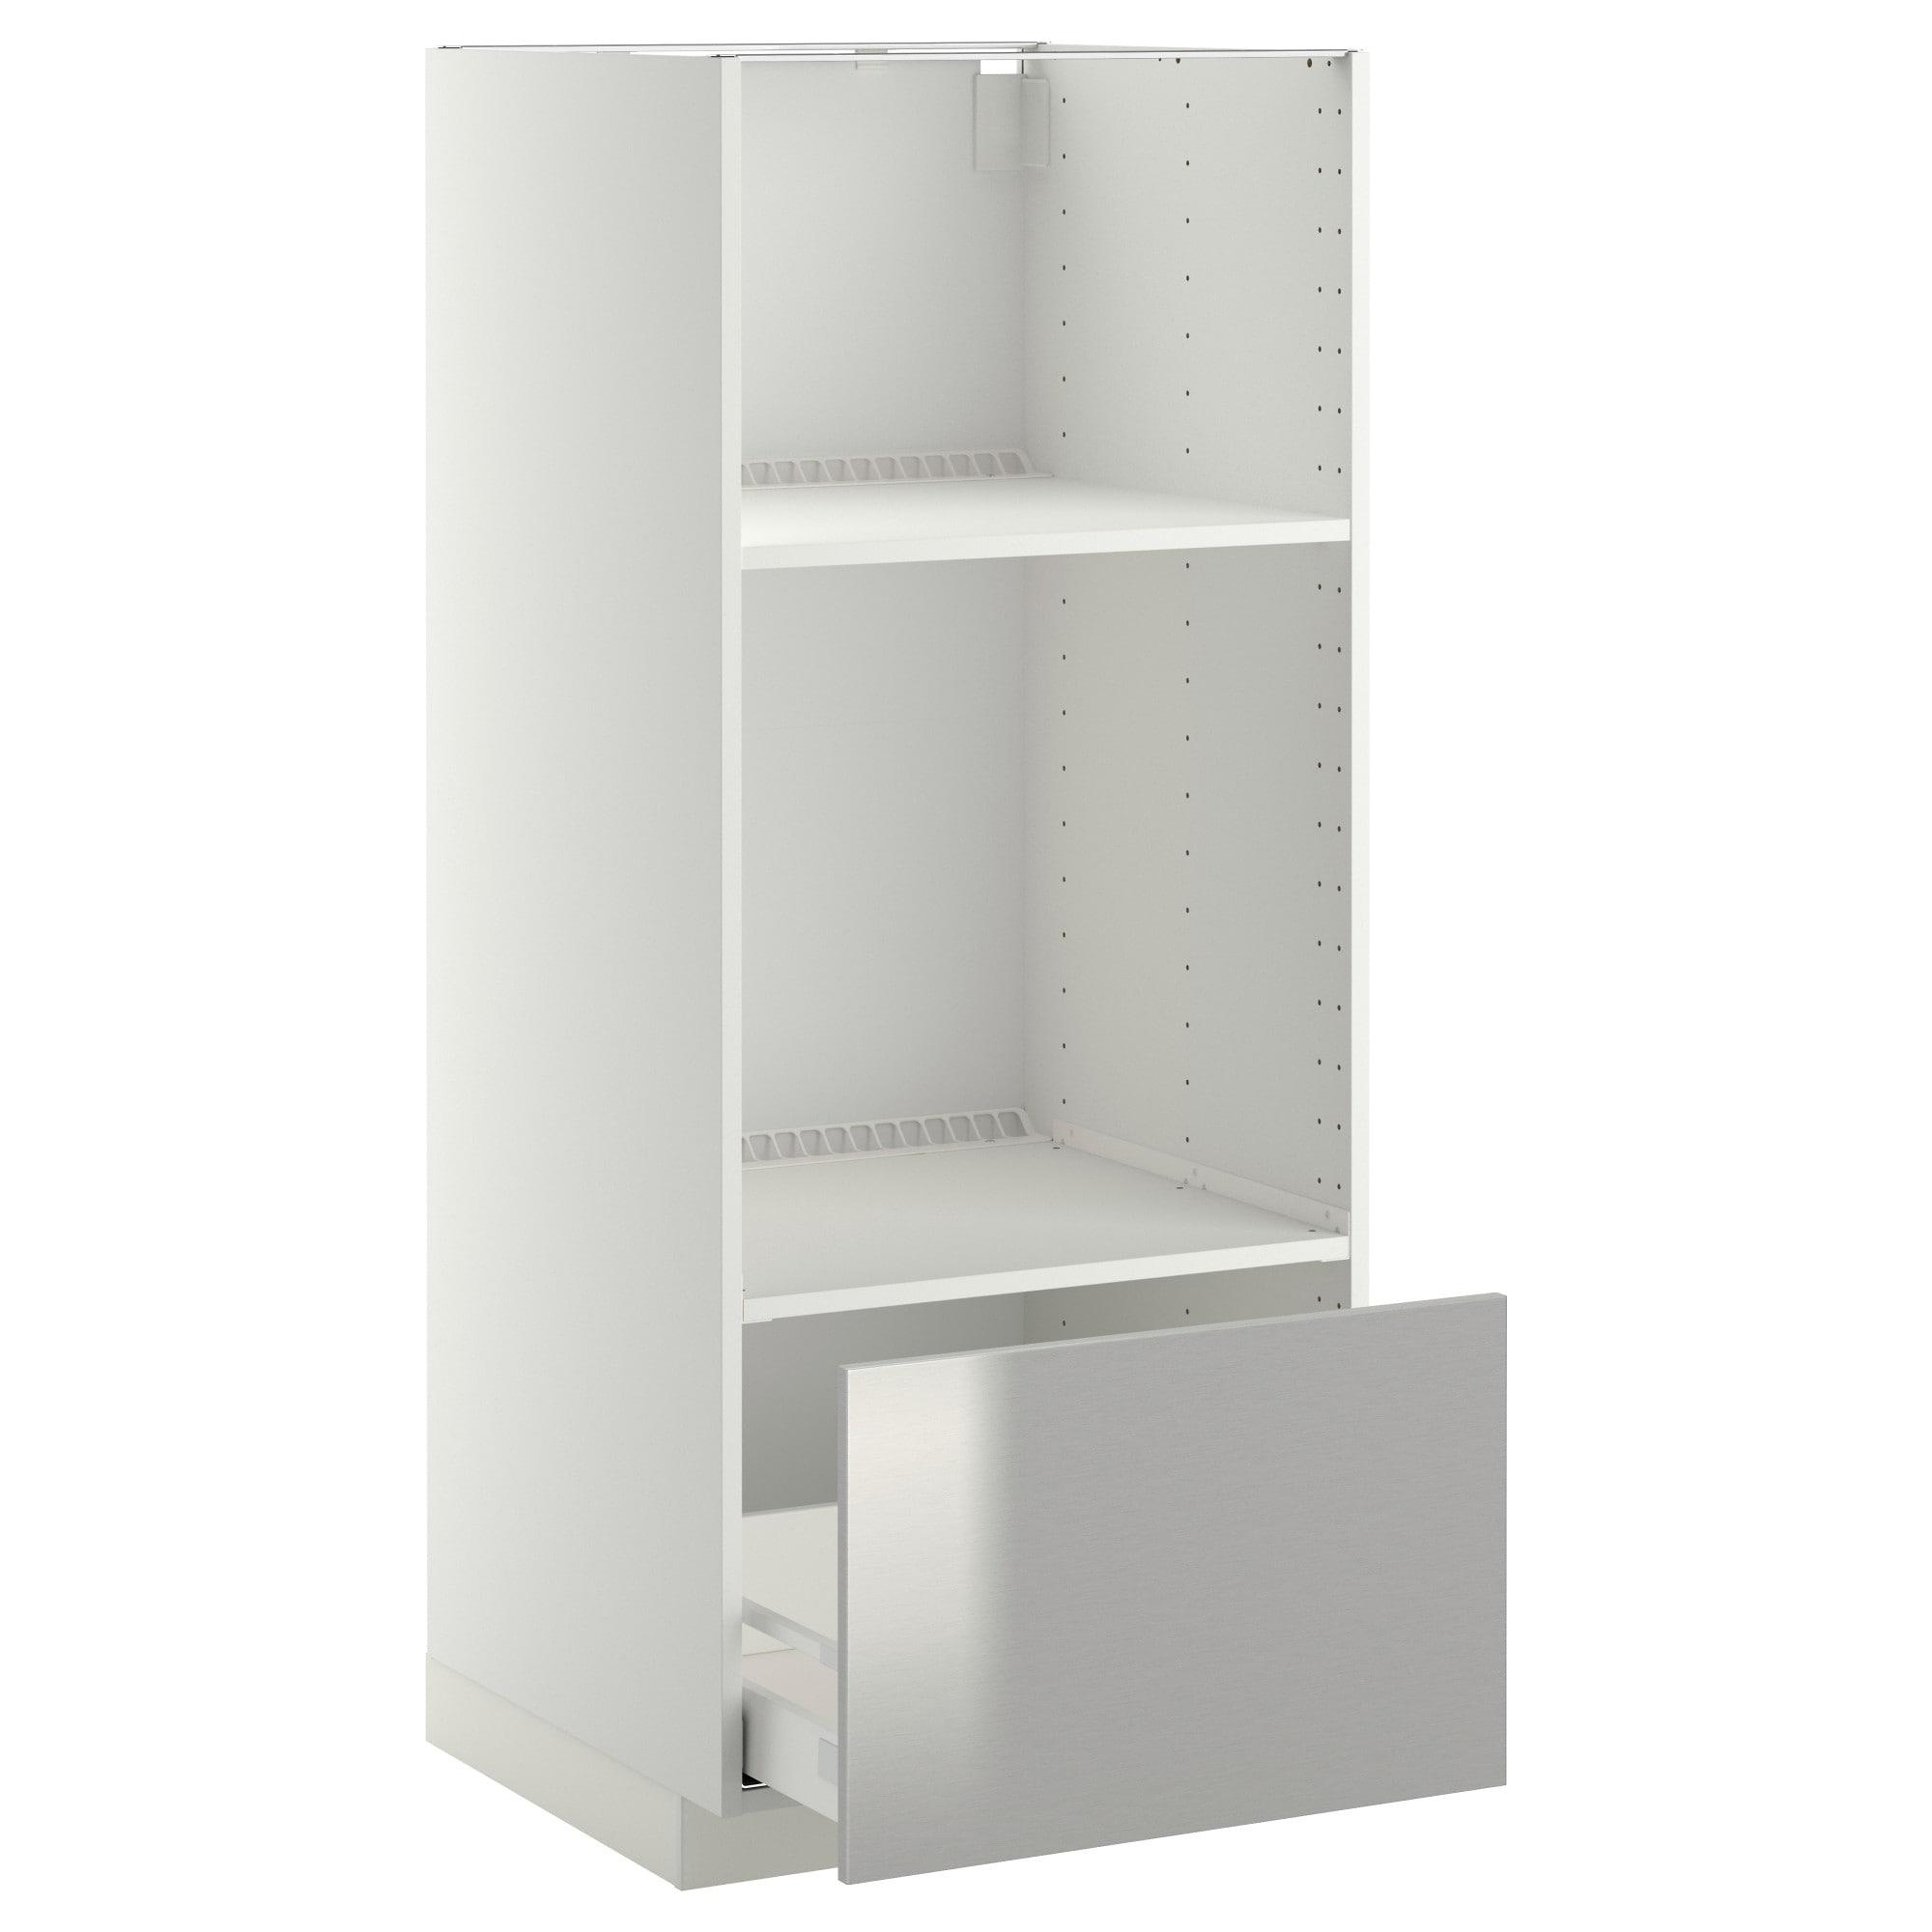 Mueble Para Horno Y Microondas Zwdg Metod Maximera Armario Alto Horno Microondas Cajà N Blanco Grevsta Ac